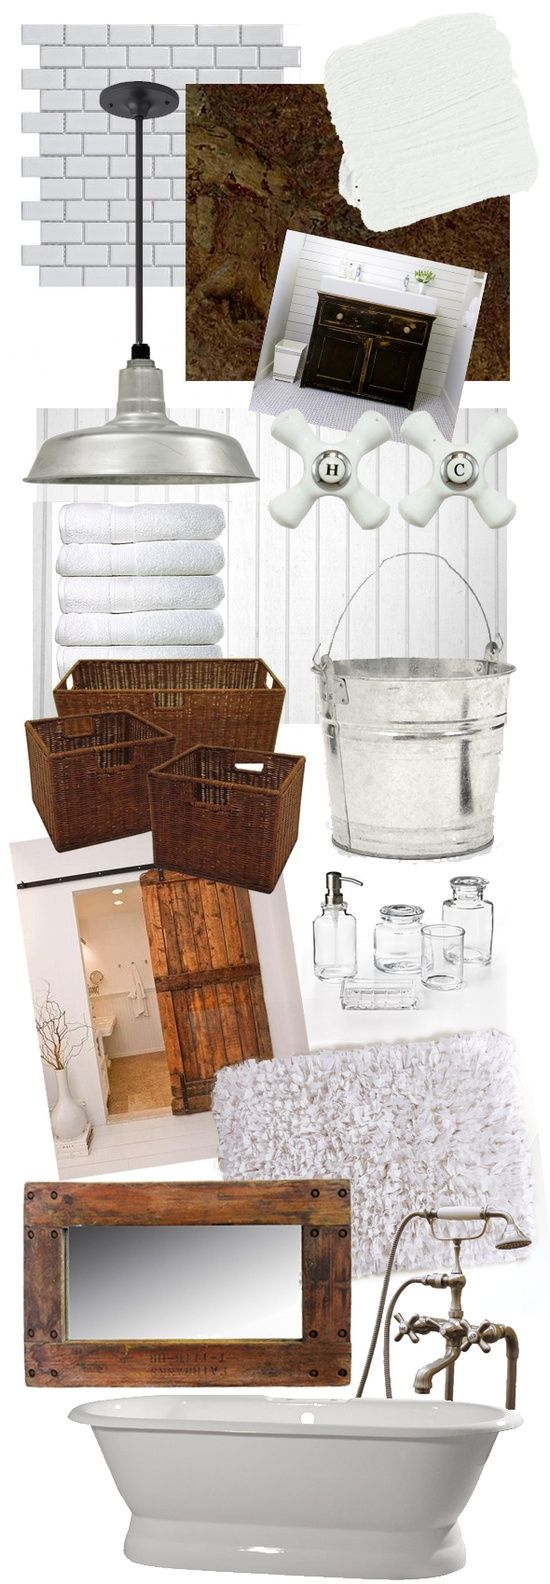 Bathroom Moodboard - Rustic - Bathroom interiors - design ideas. H/C handles, light, tile